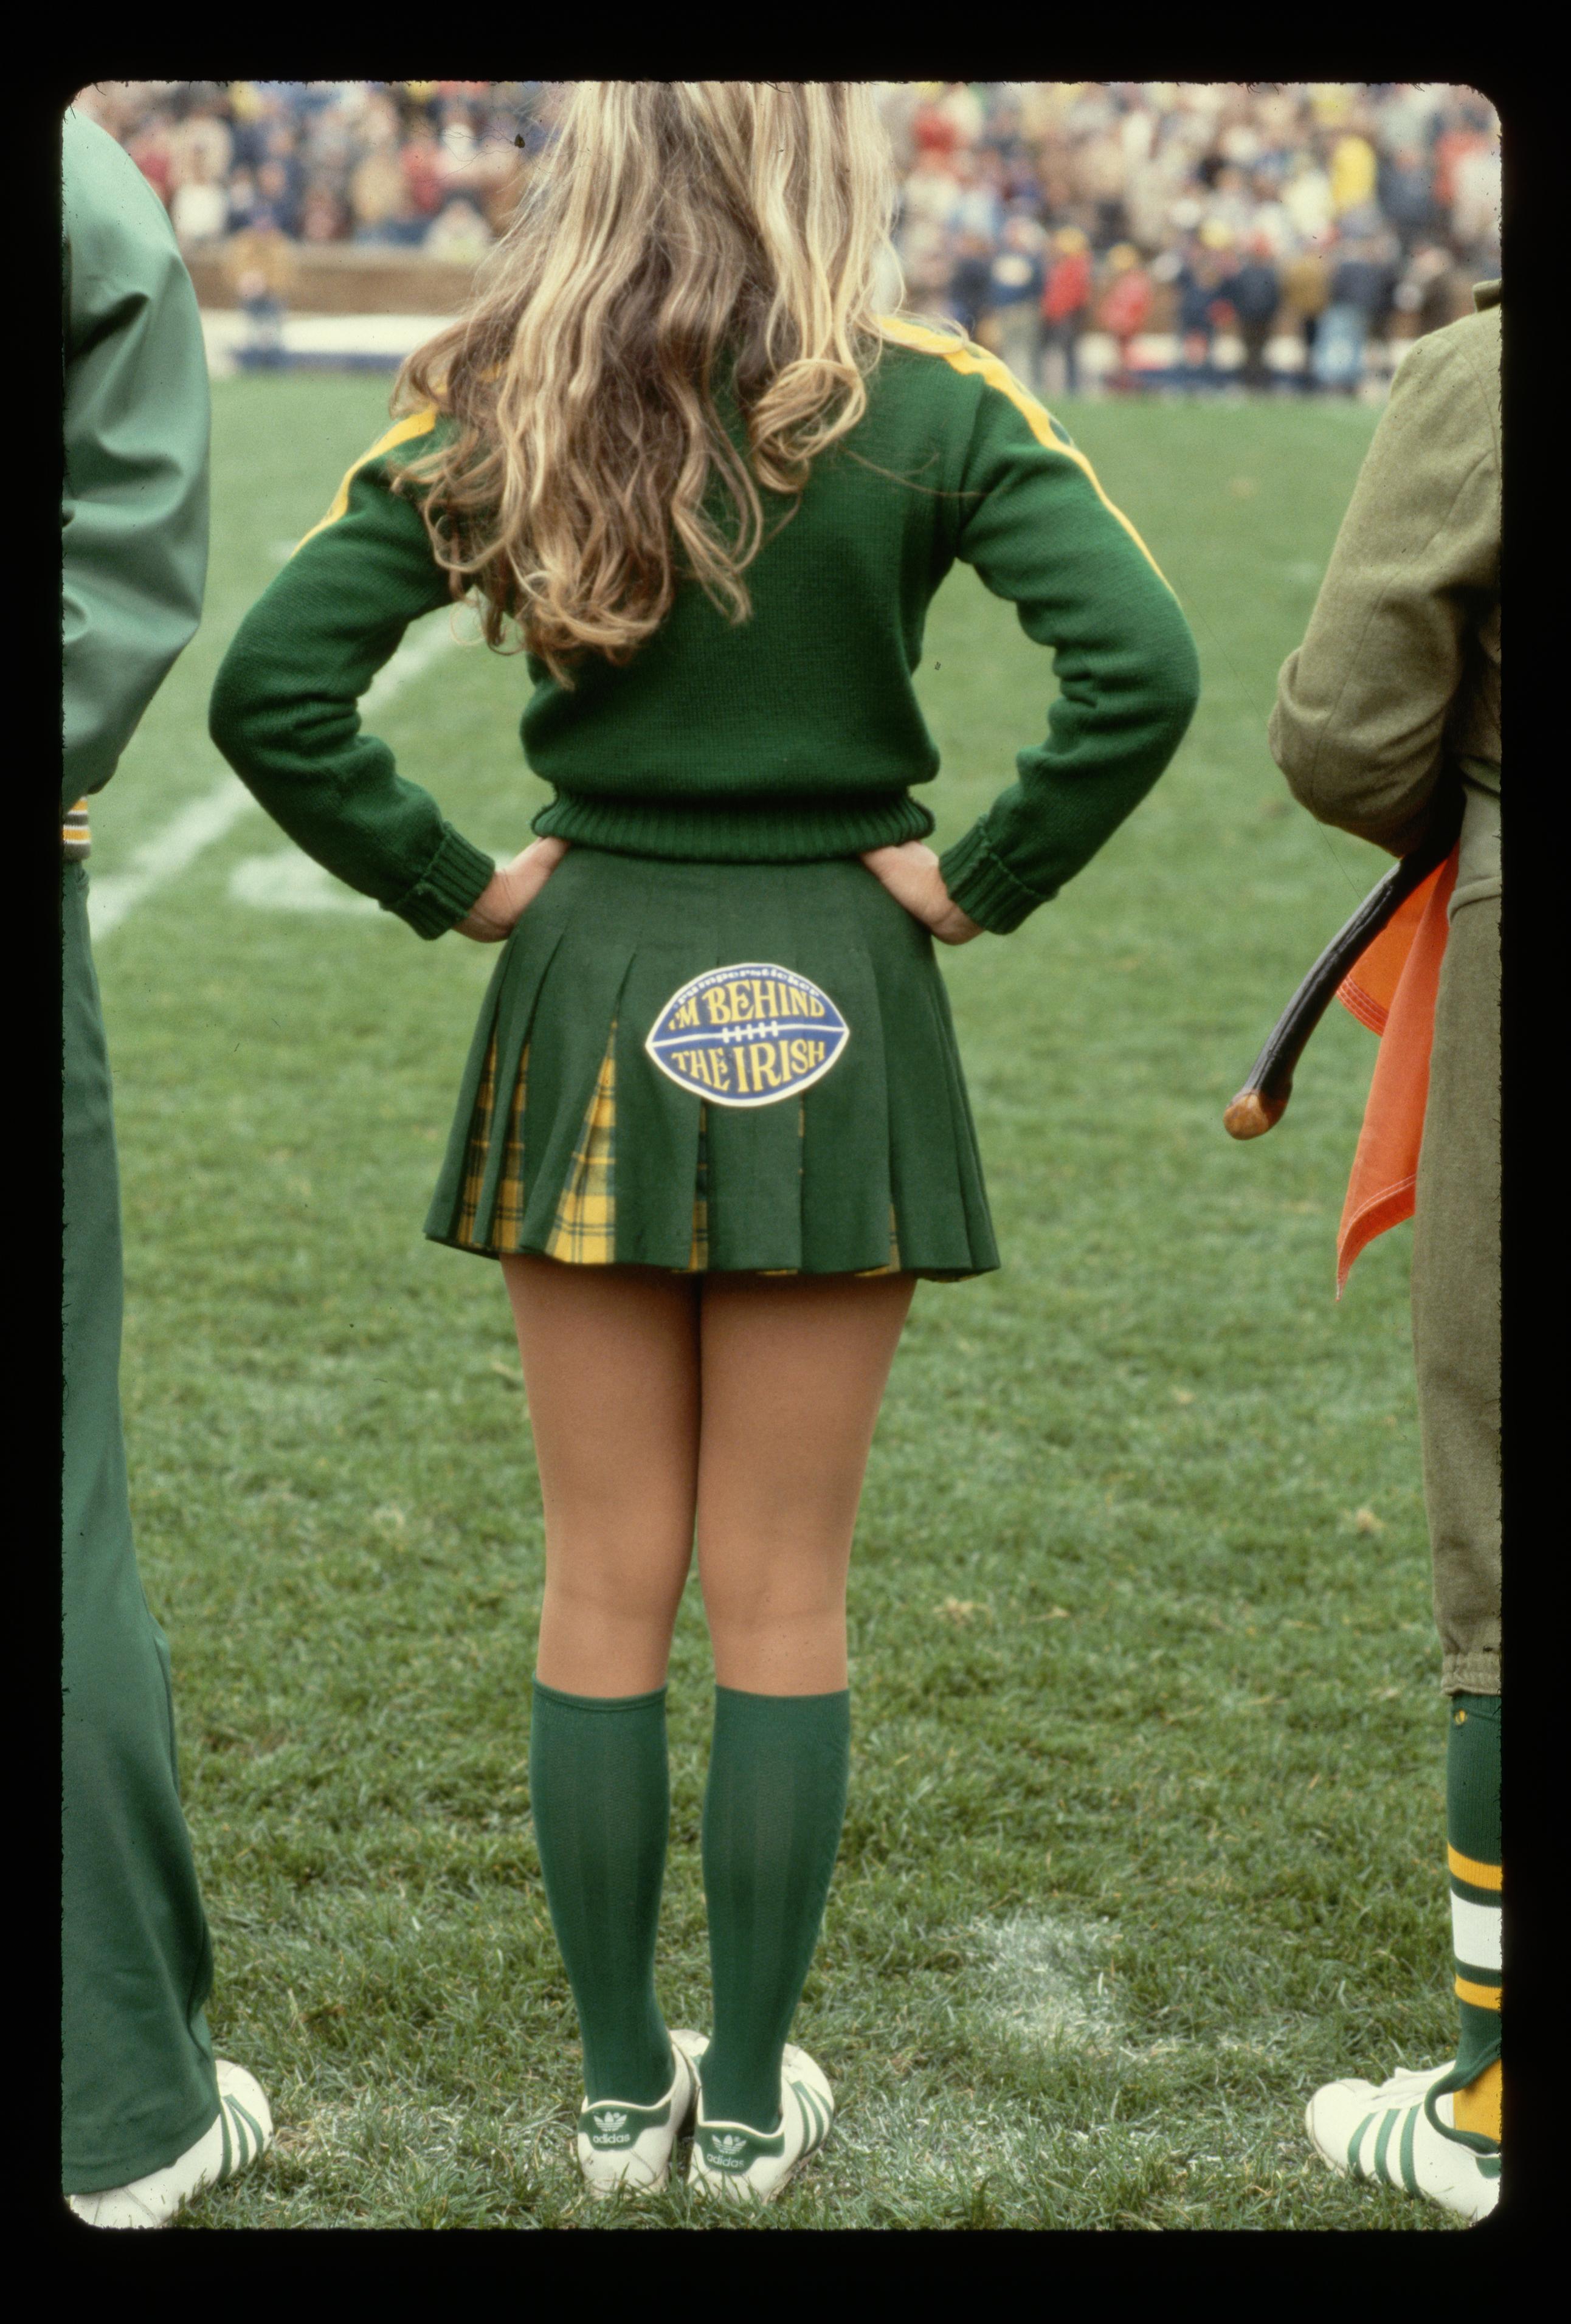 Notre Dame Cheerleader at a Football Game